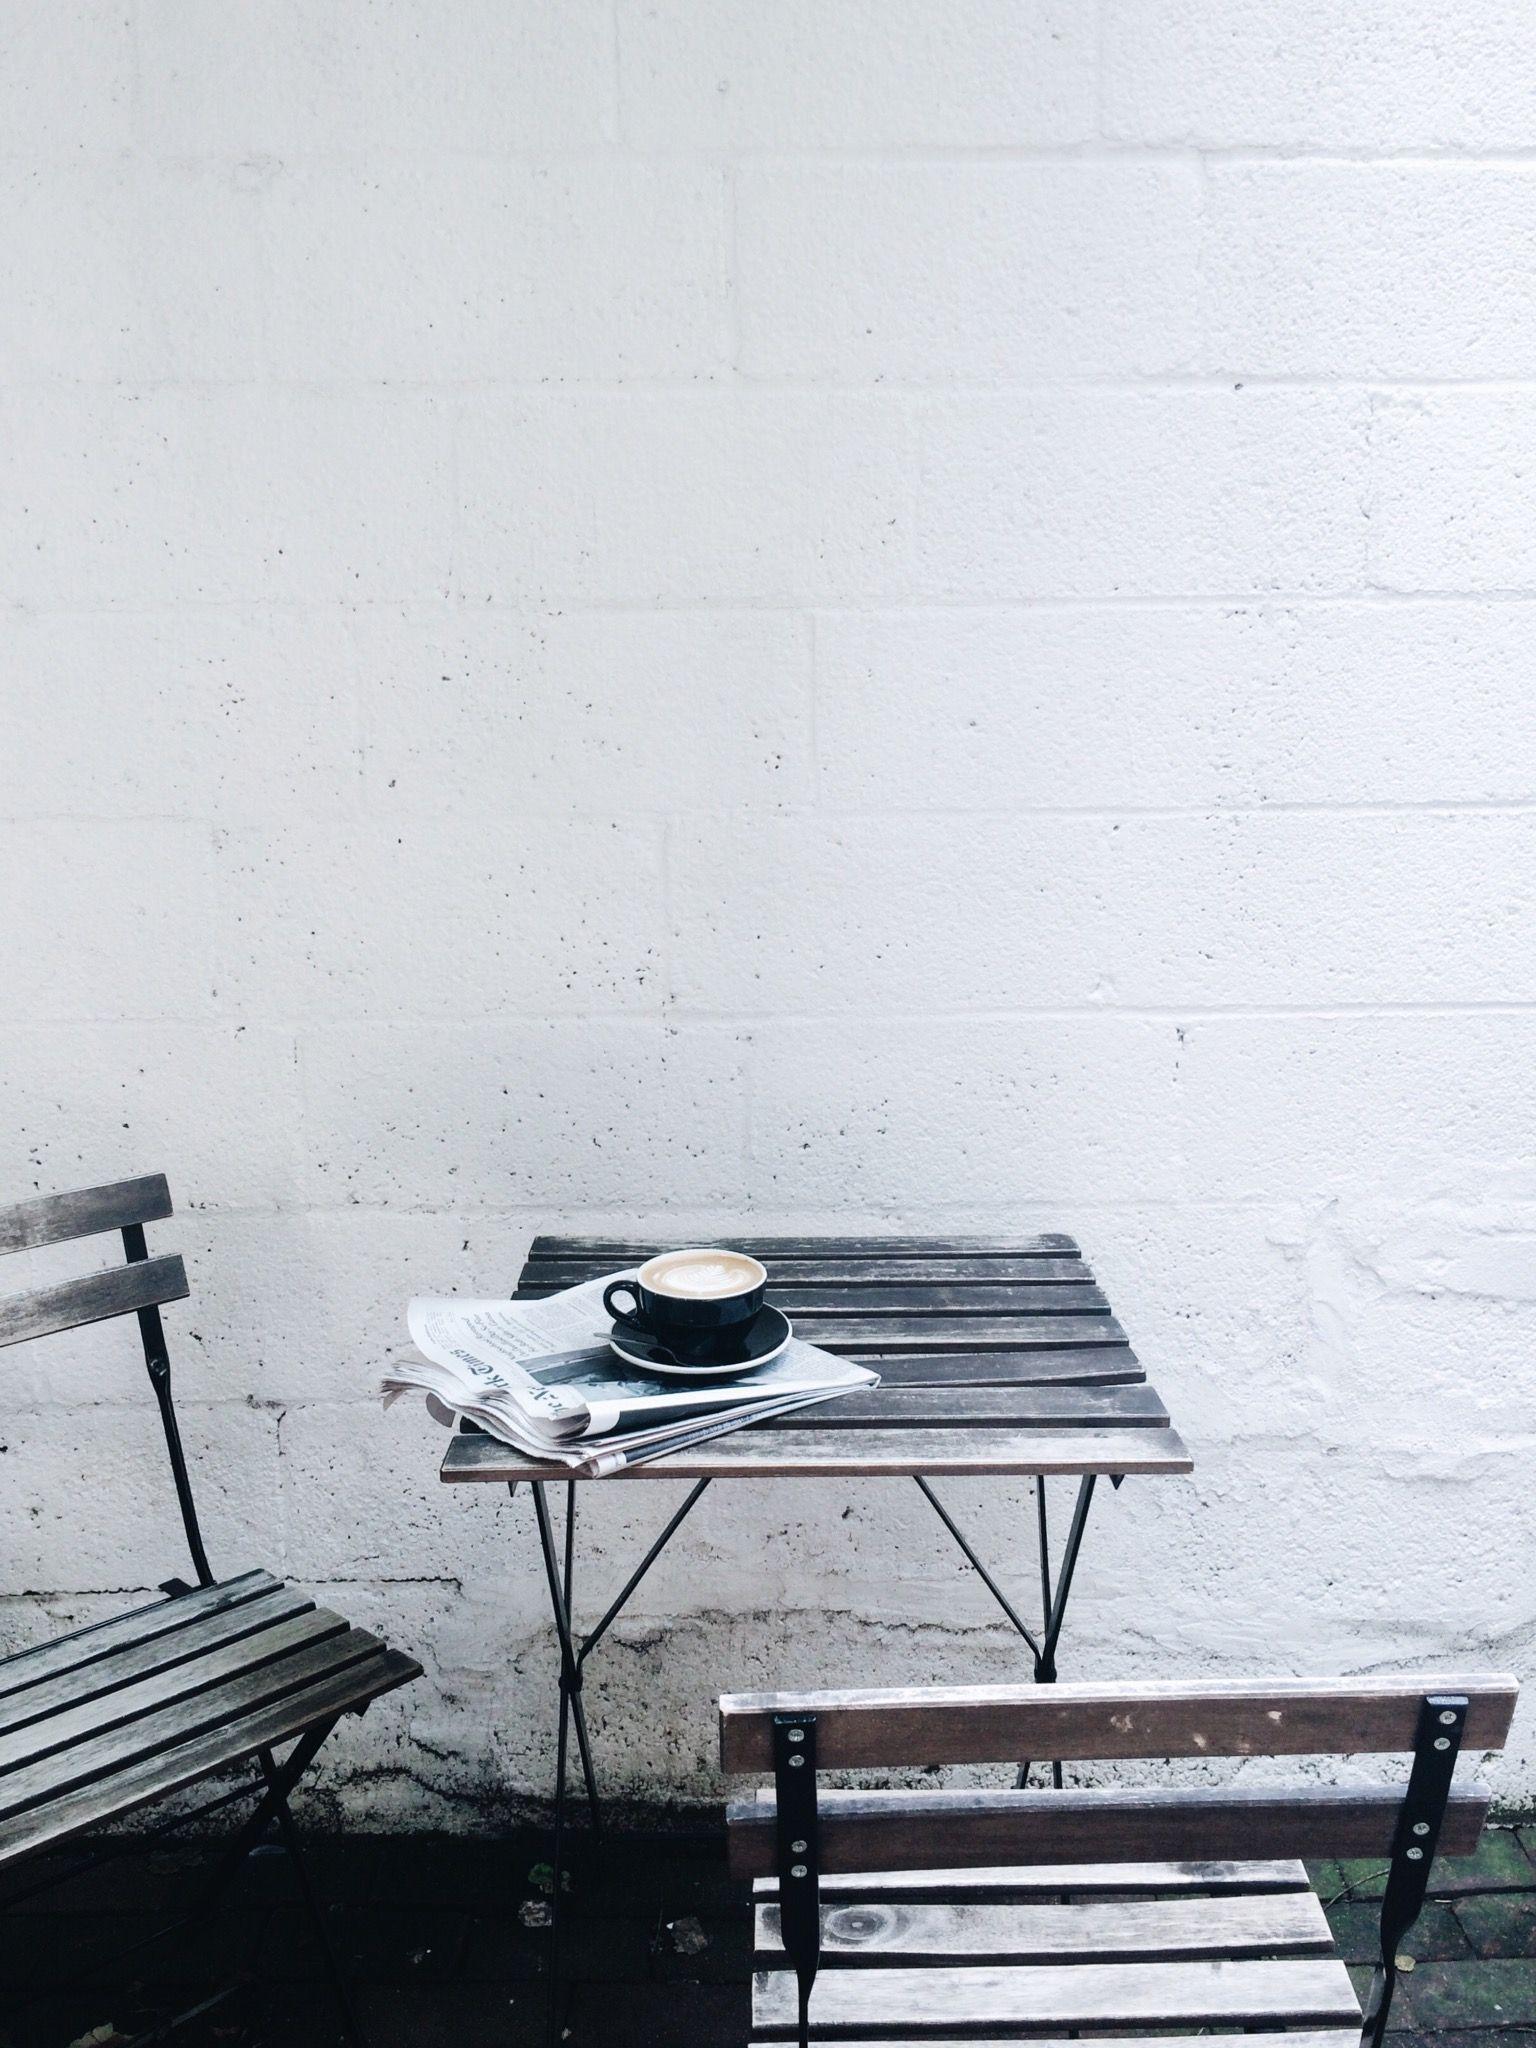 Café Grumpy. #nyc #coffee | Nana Tsay | VSCO Grid